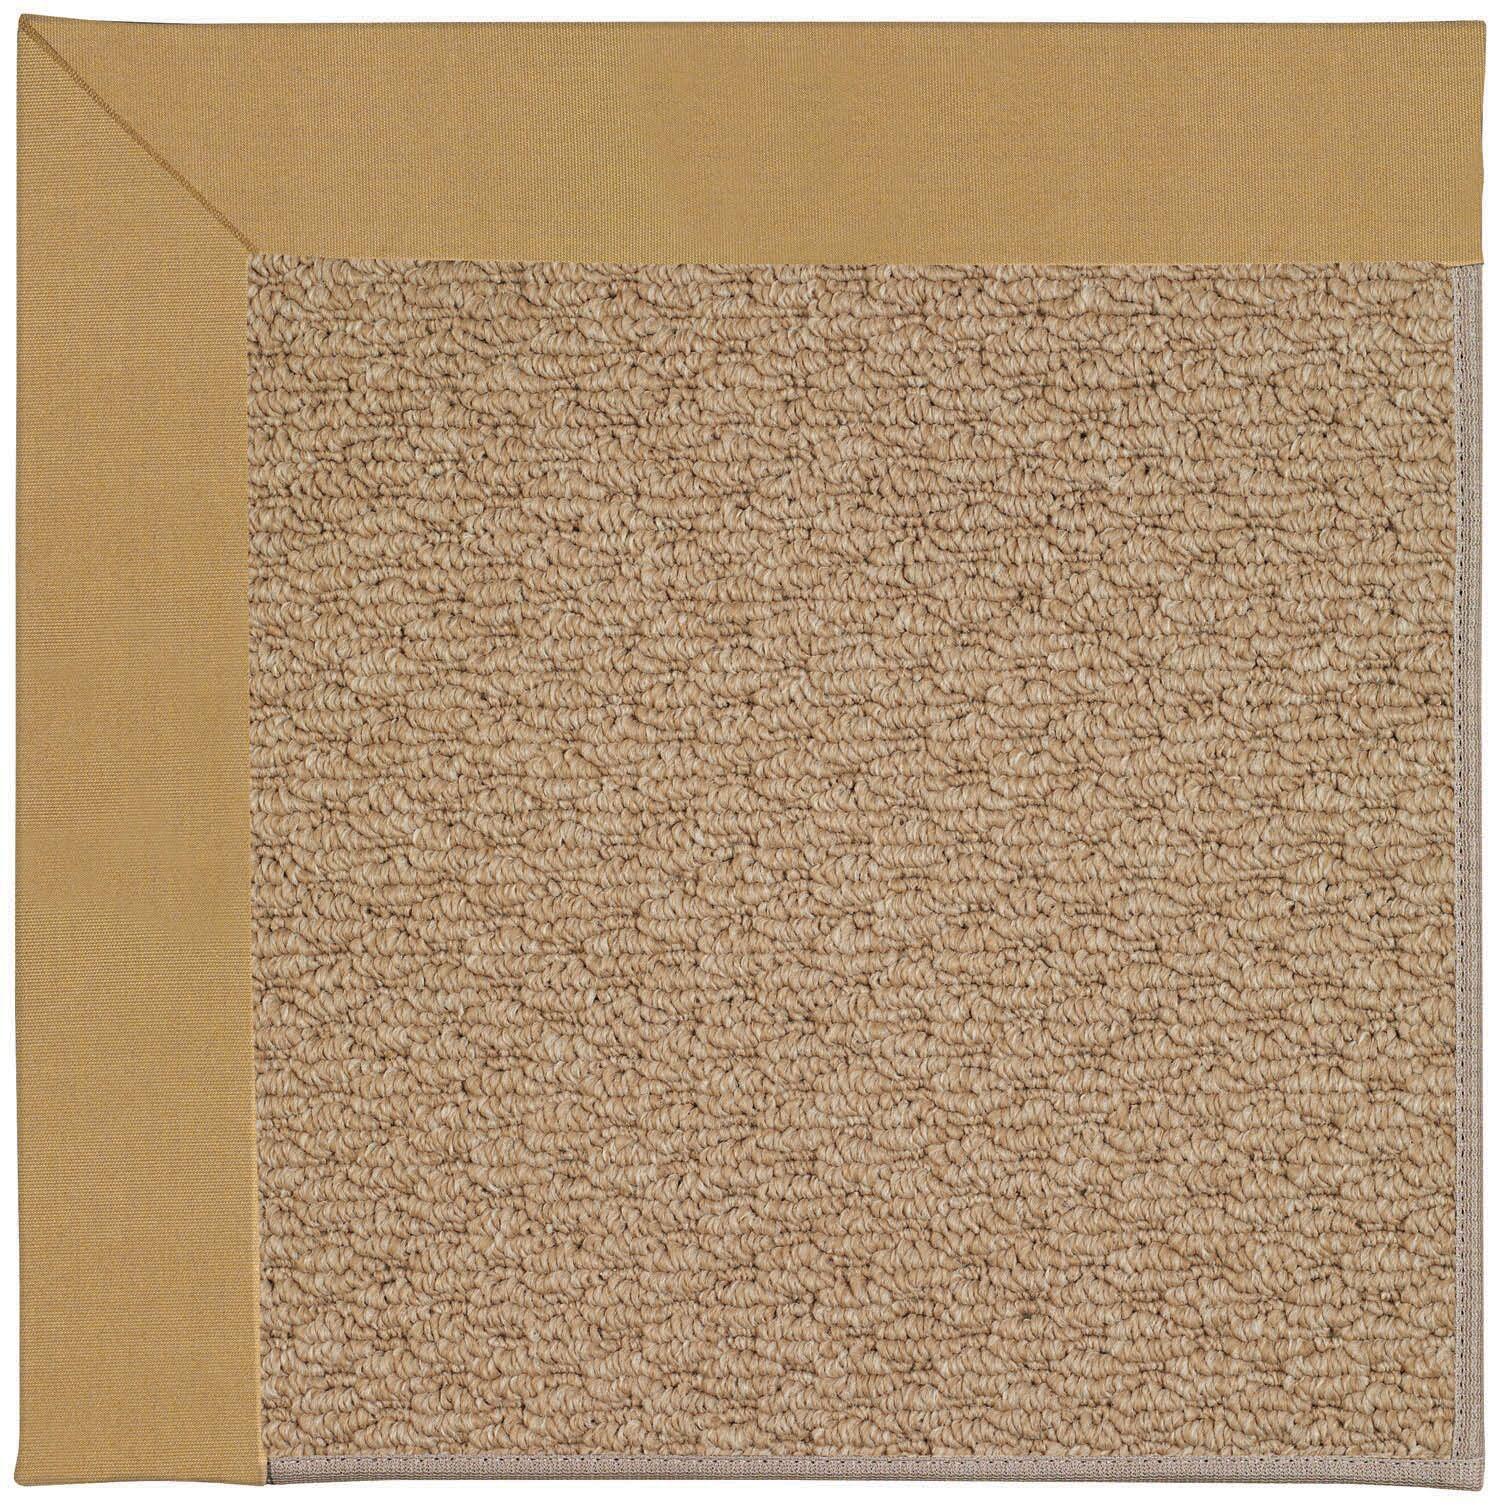 Lisle Machine Tufted Bronze Indoor/Outdoor Area Rug Rug Size: Rectangle 7' x 9'